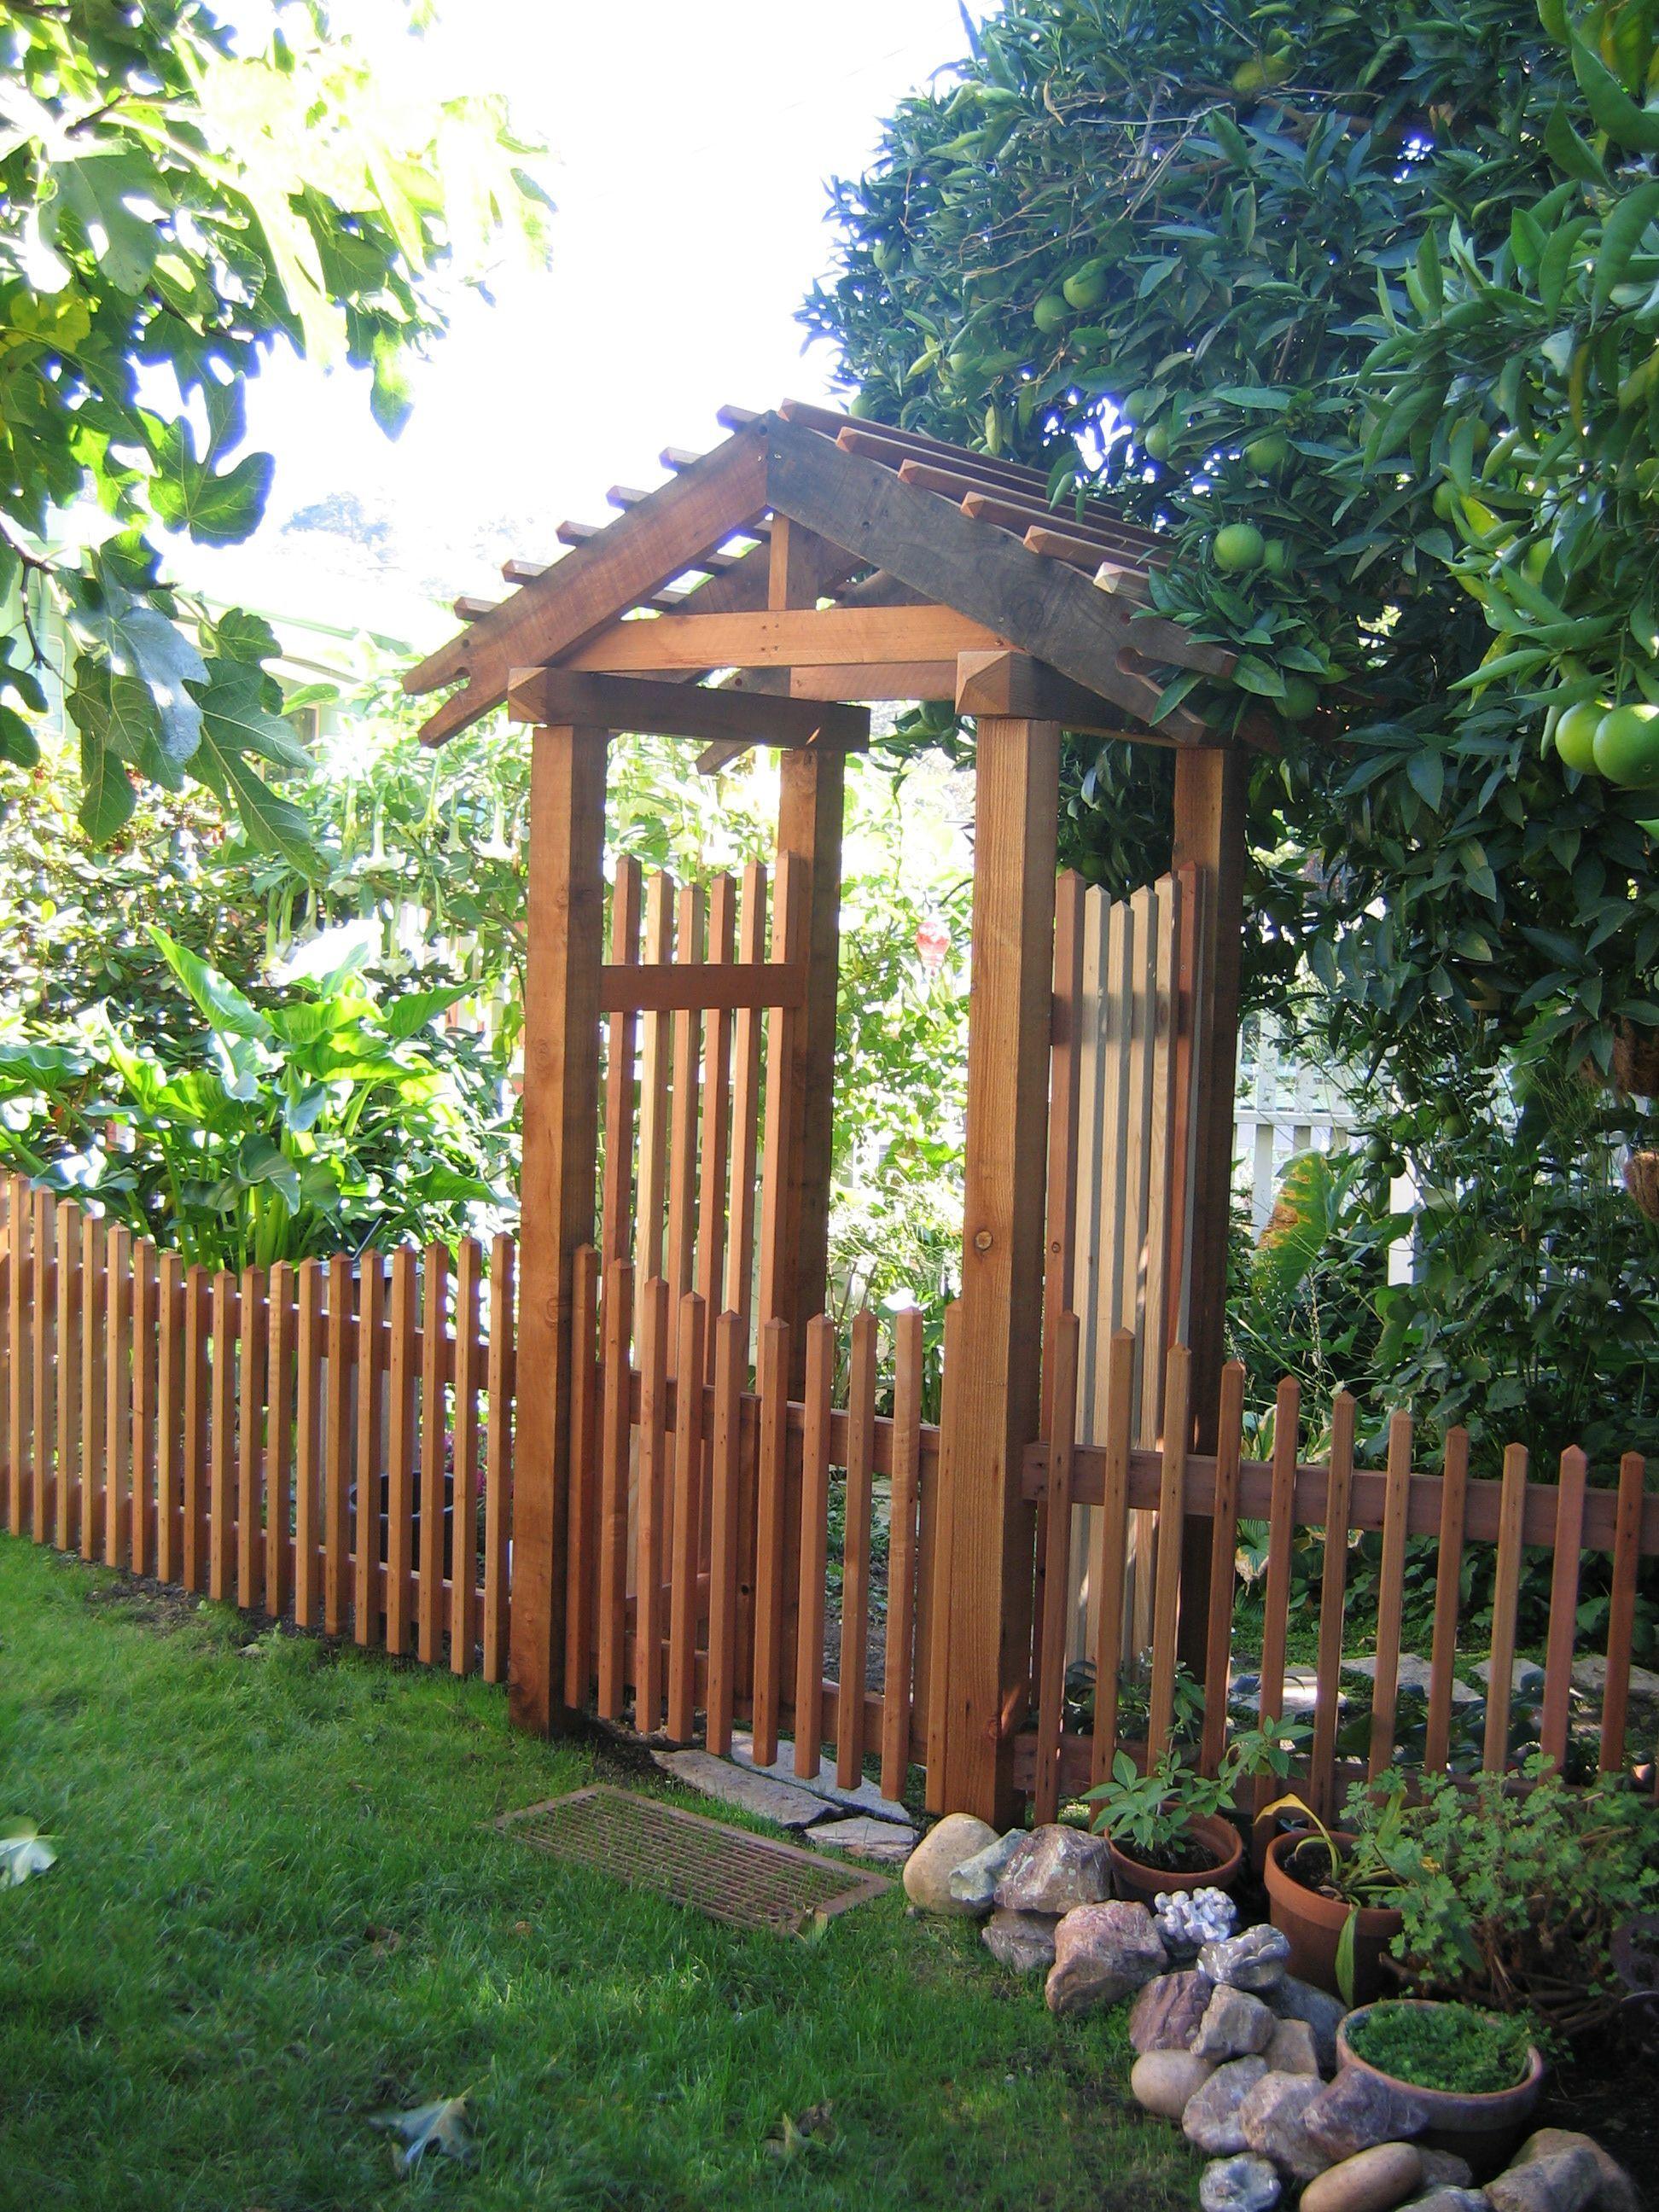 40 Beautiful Garden Fences And Walls Ideas Garden Archway